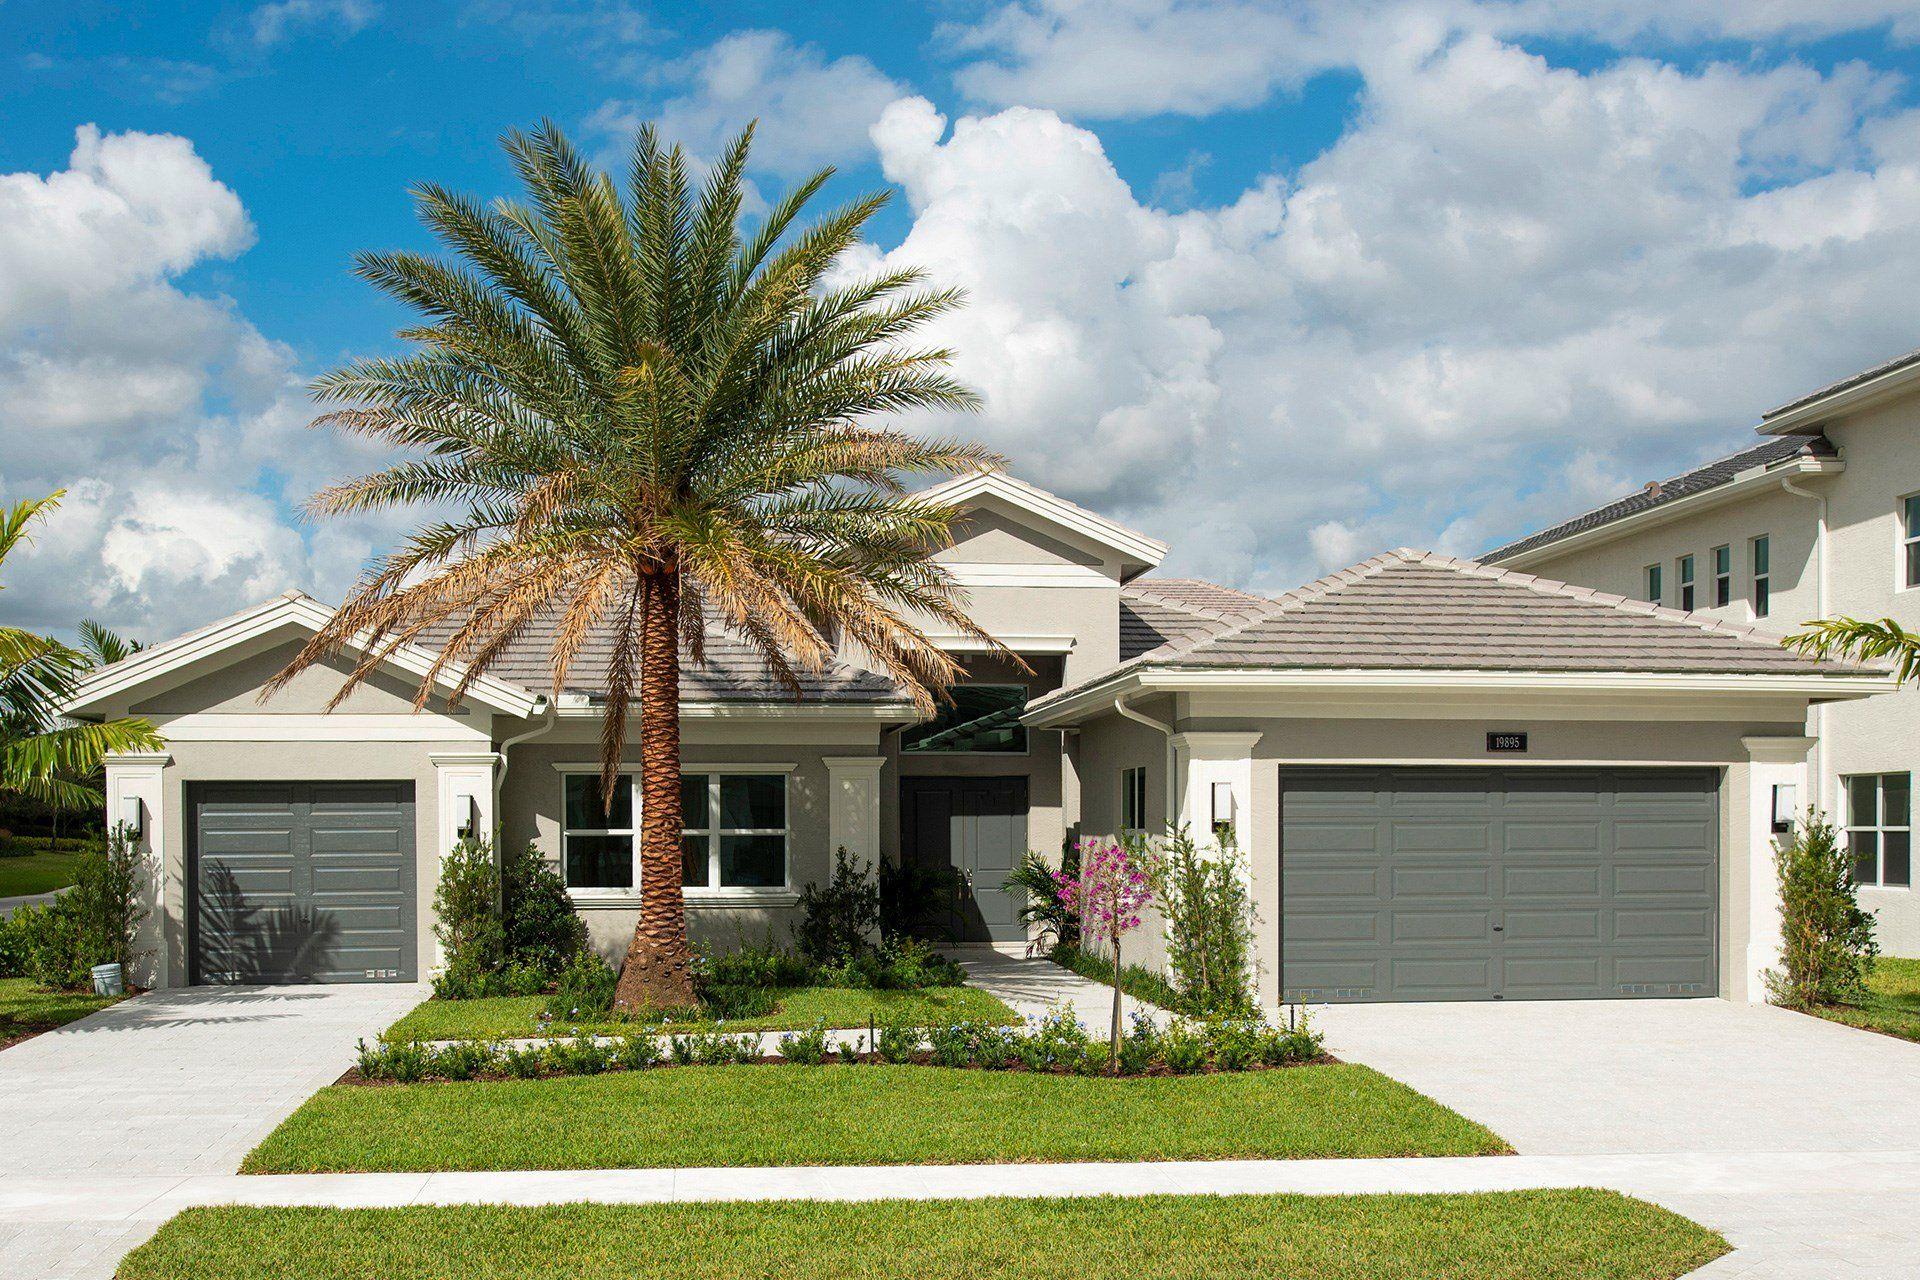 The Napa Plan At Berkeley In Boca Raton Florida Florida Real Estate Gl Homes Florida Real Estate G Florida Real Estate House Layout Plans Patio Upgrade